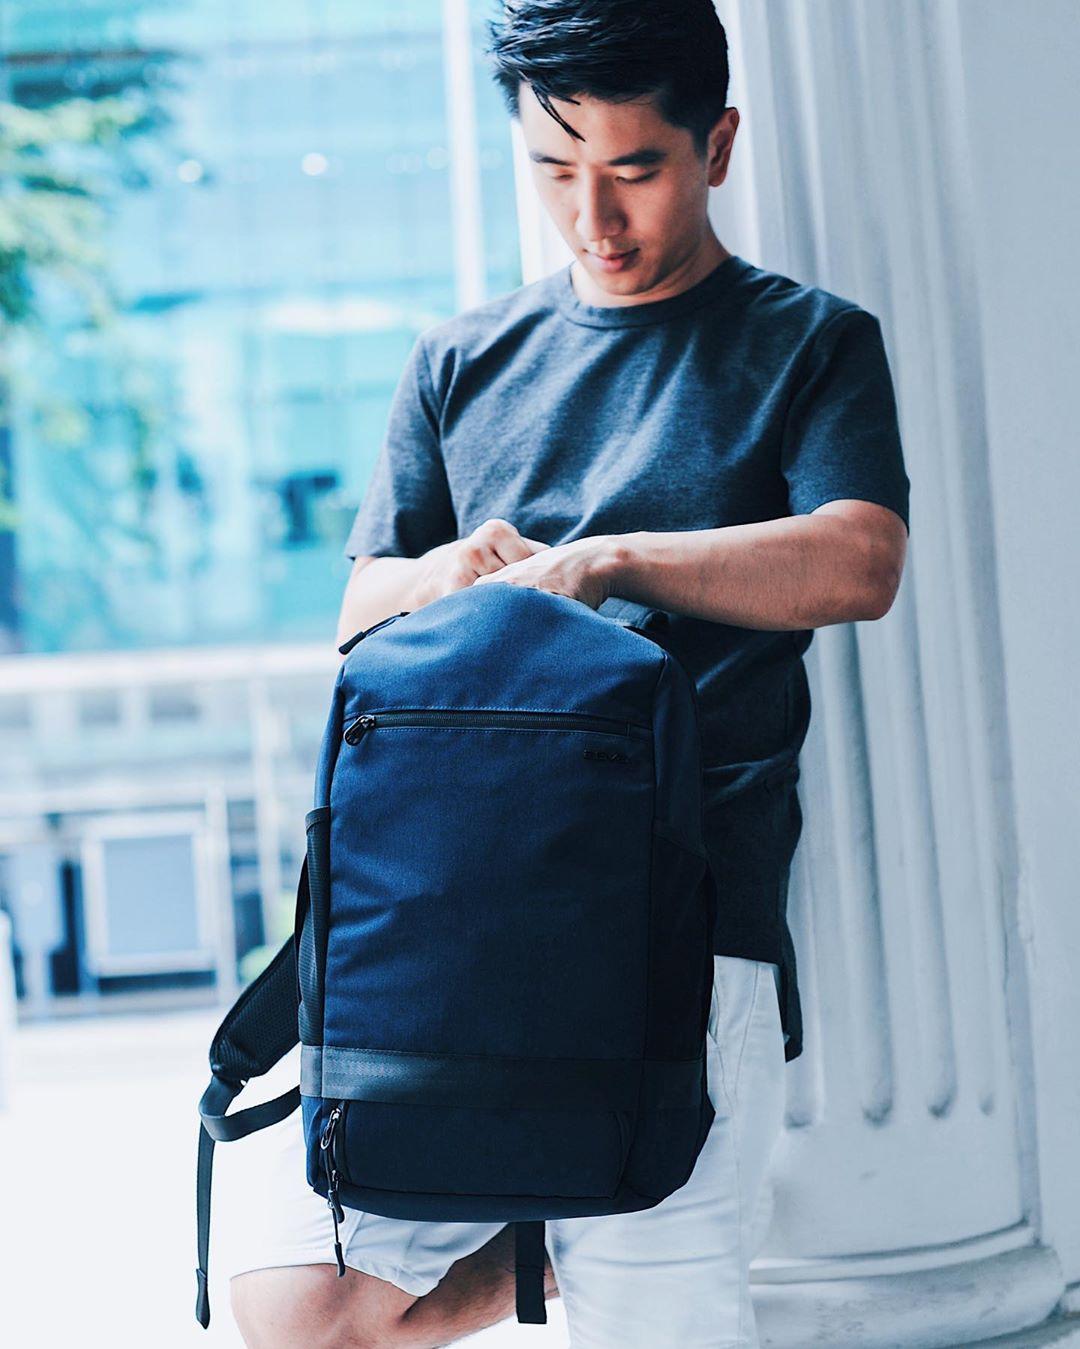 Balo Agva traveller daypack 15.6 inch xanh dương-ltb357blue